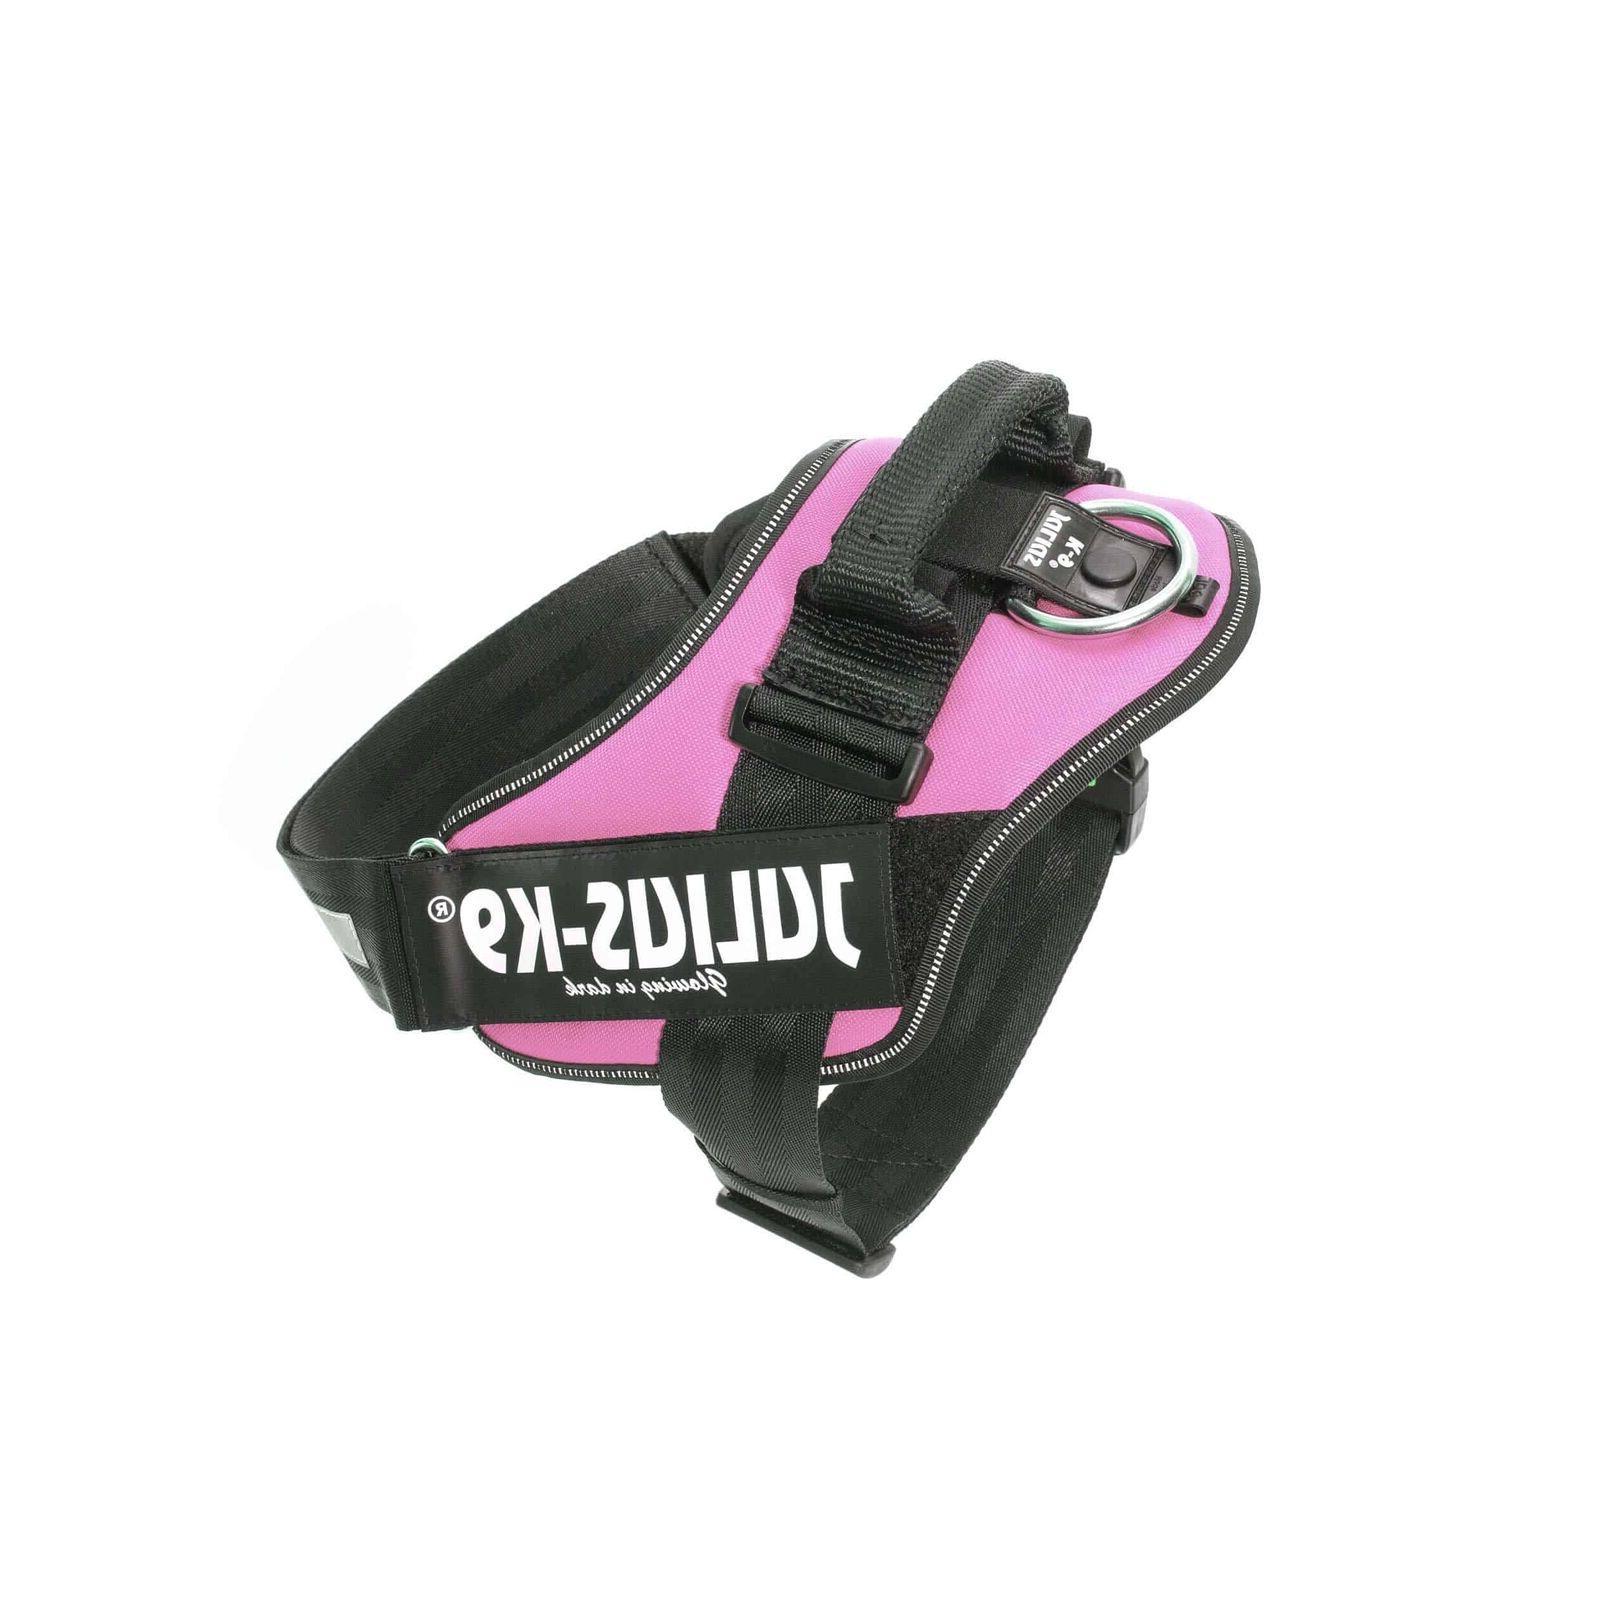 Julius-K9 IDC® Puppy Harness Strong Adjustable Reflective FREE UK